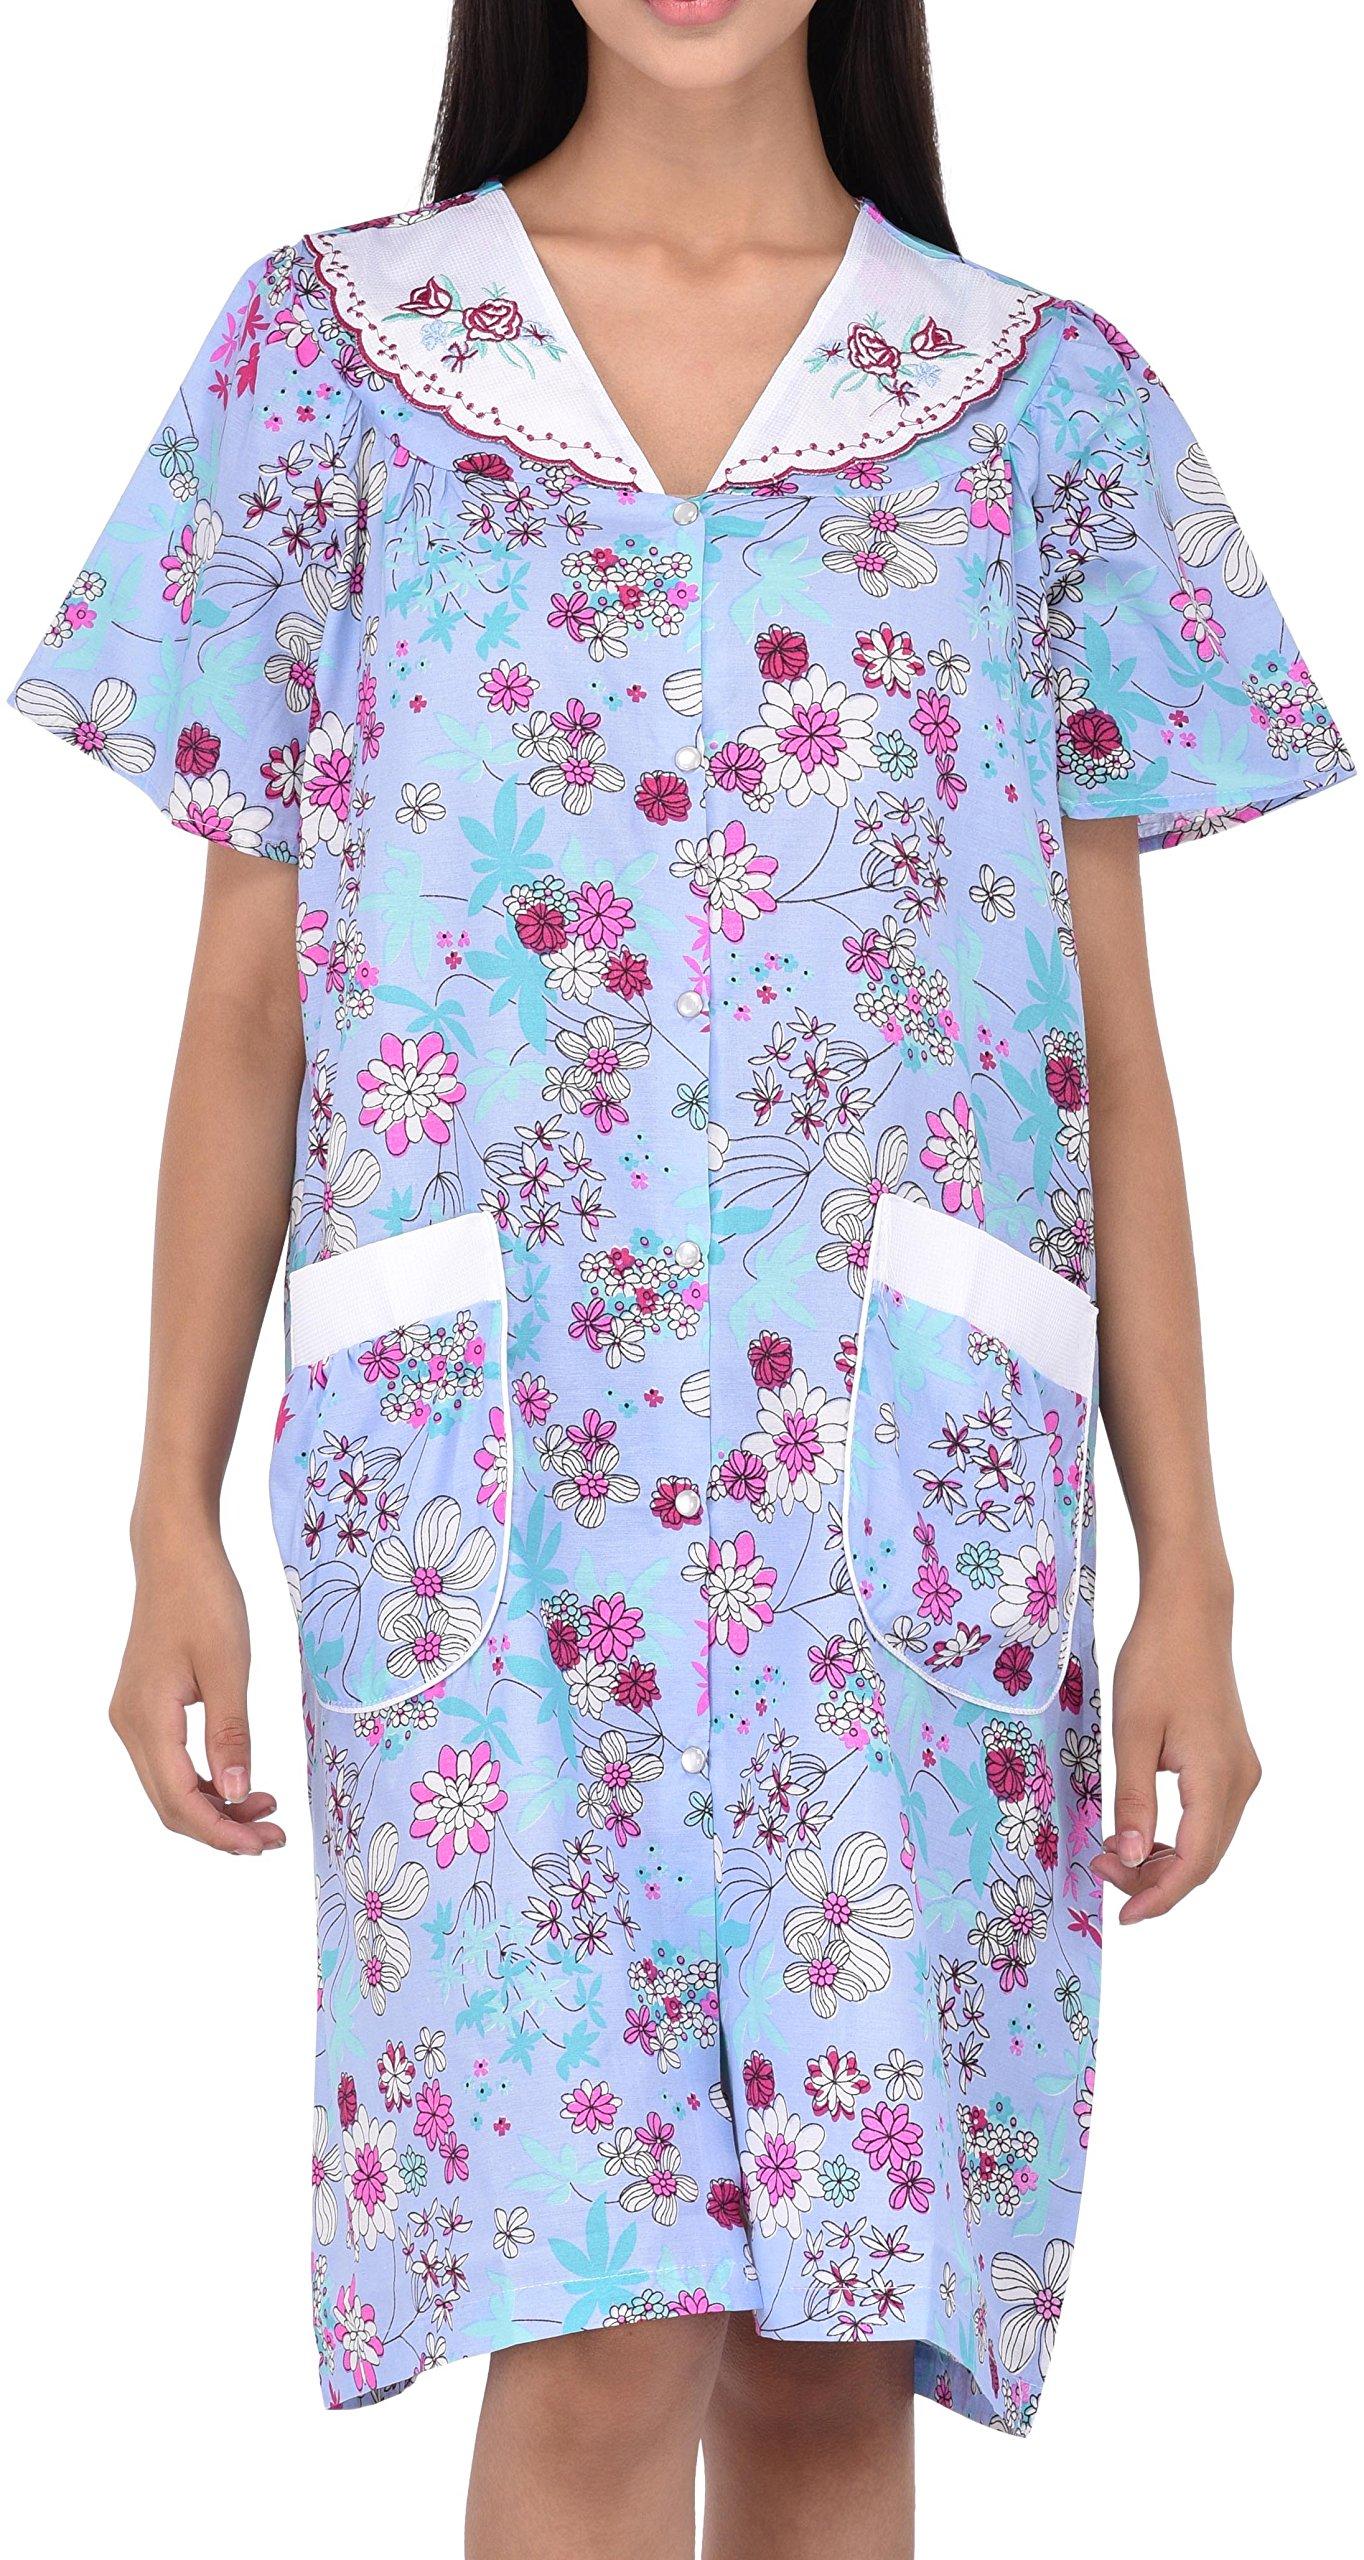 Available at Amazon: EZI Women's Snap-Up Short Sleeve Cotton House Coat